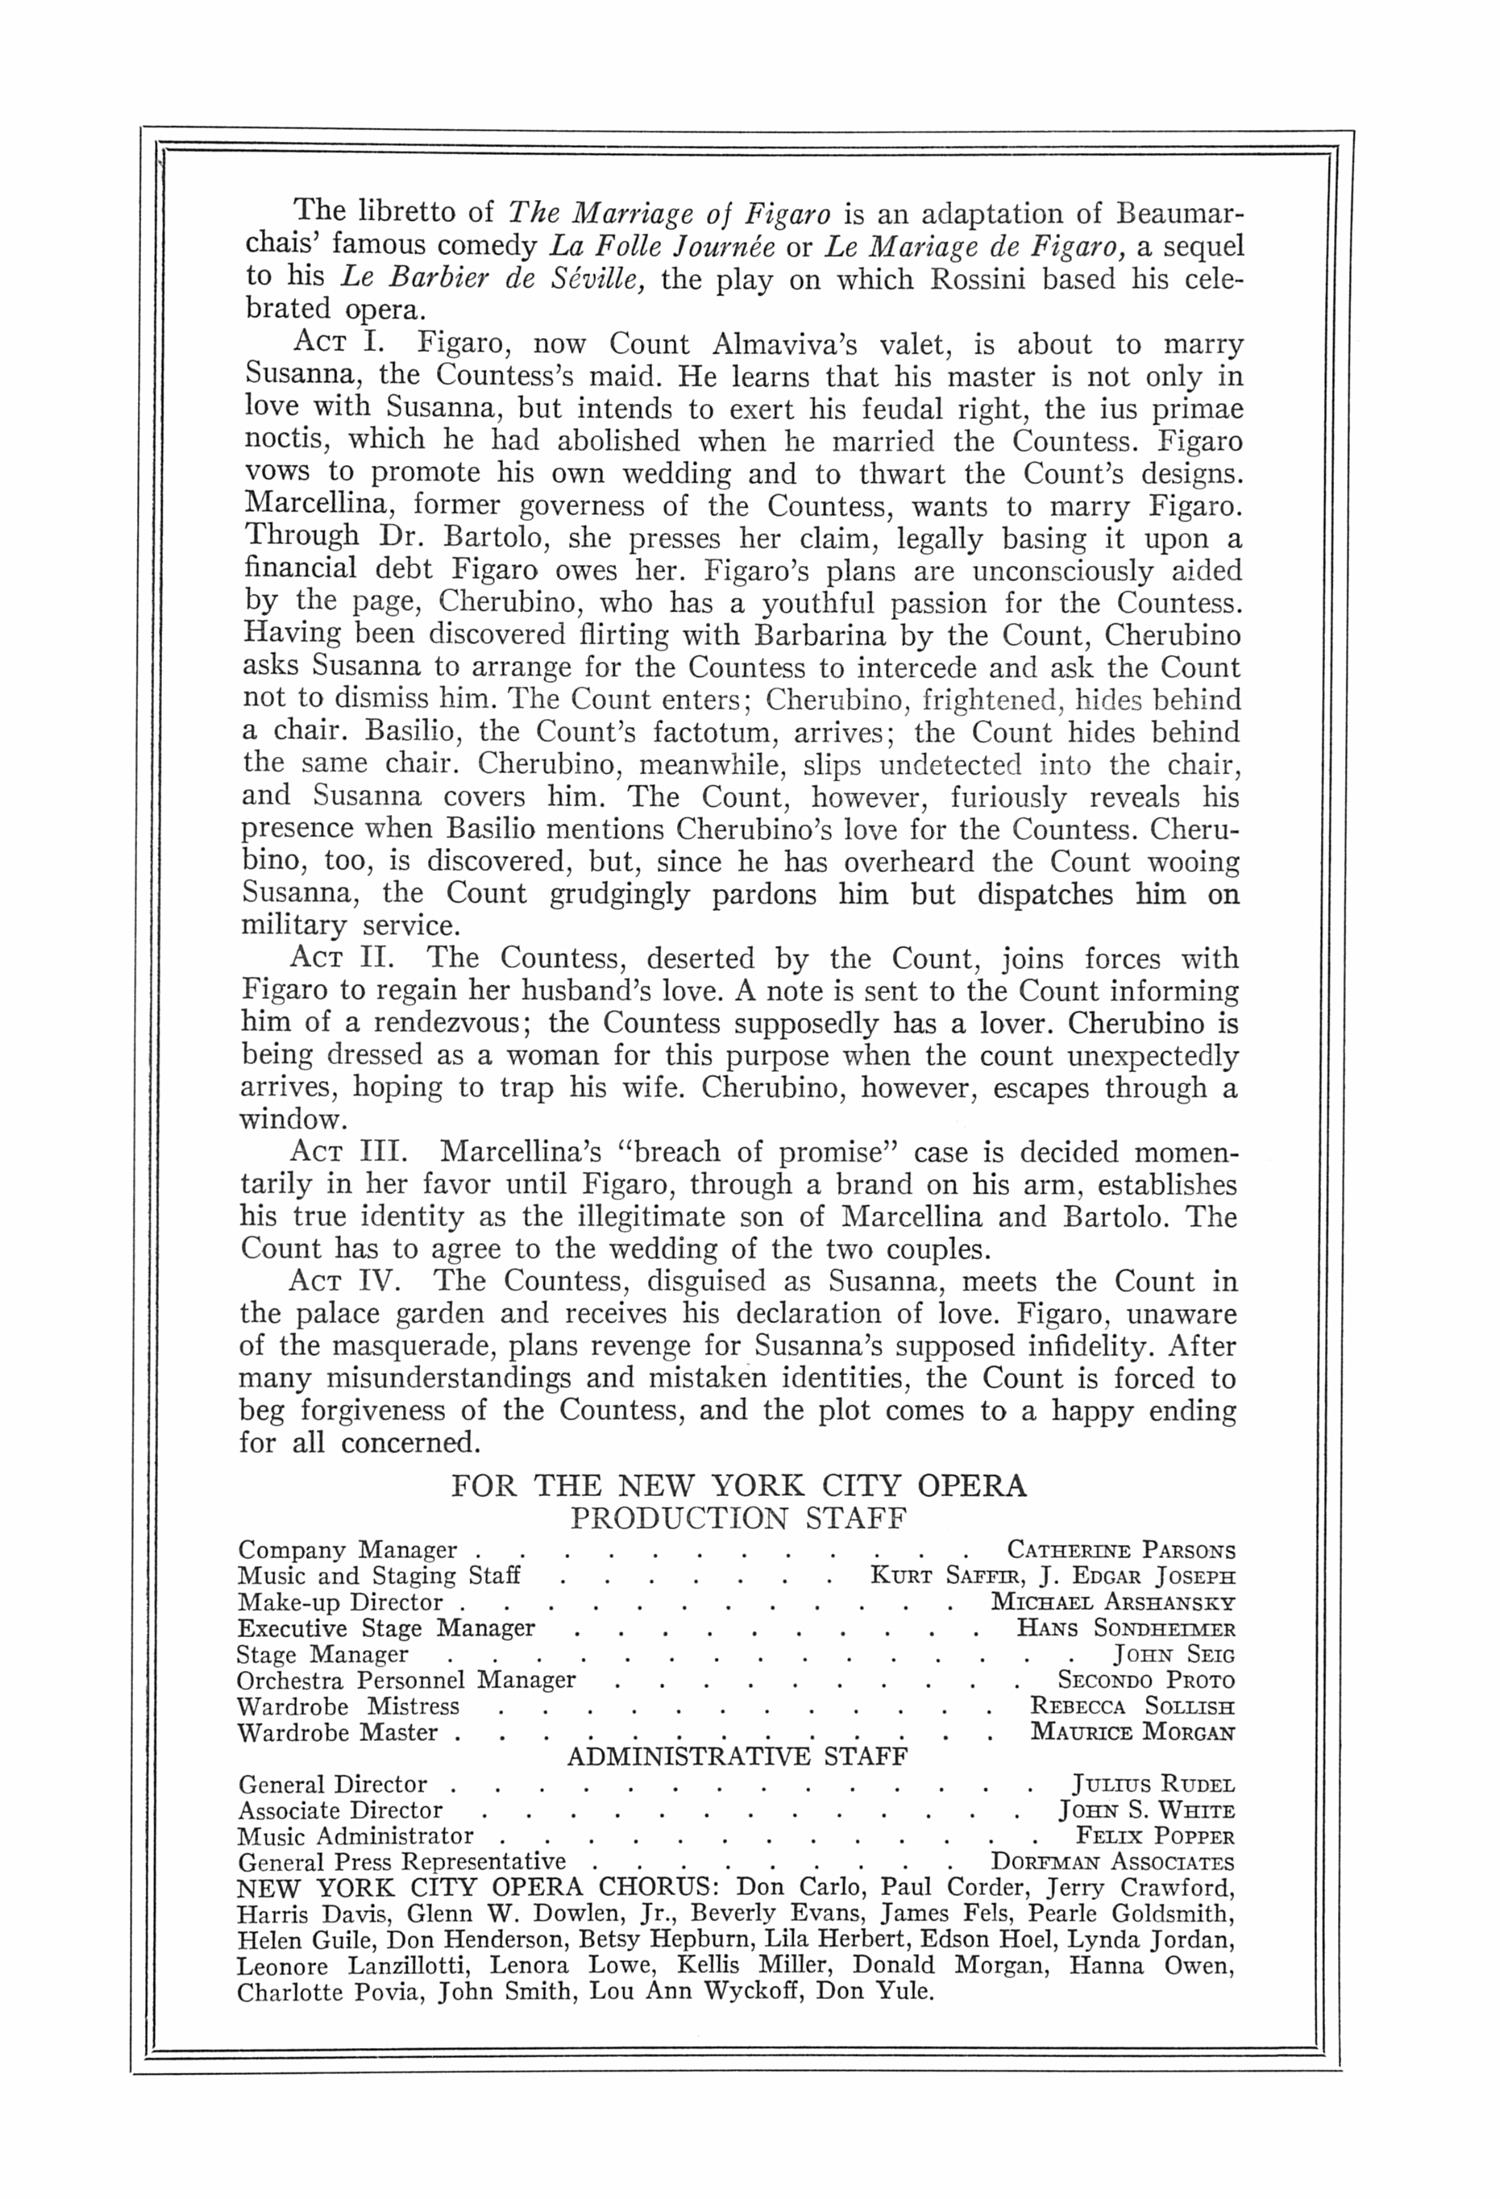 UMS Concert Program, November 17, 1962: New York City